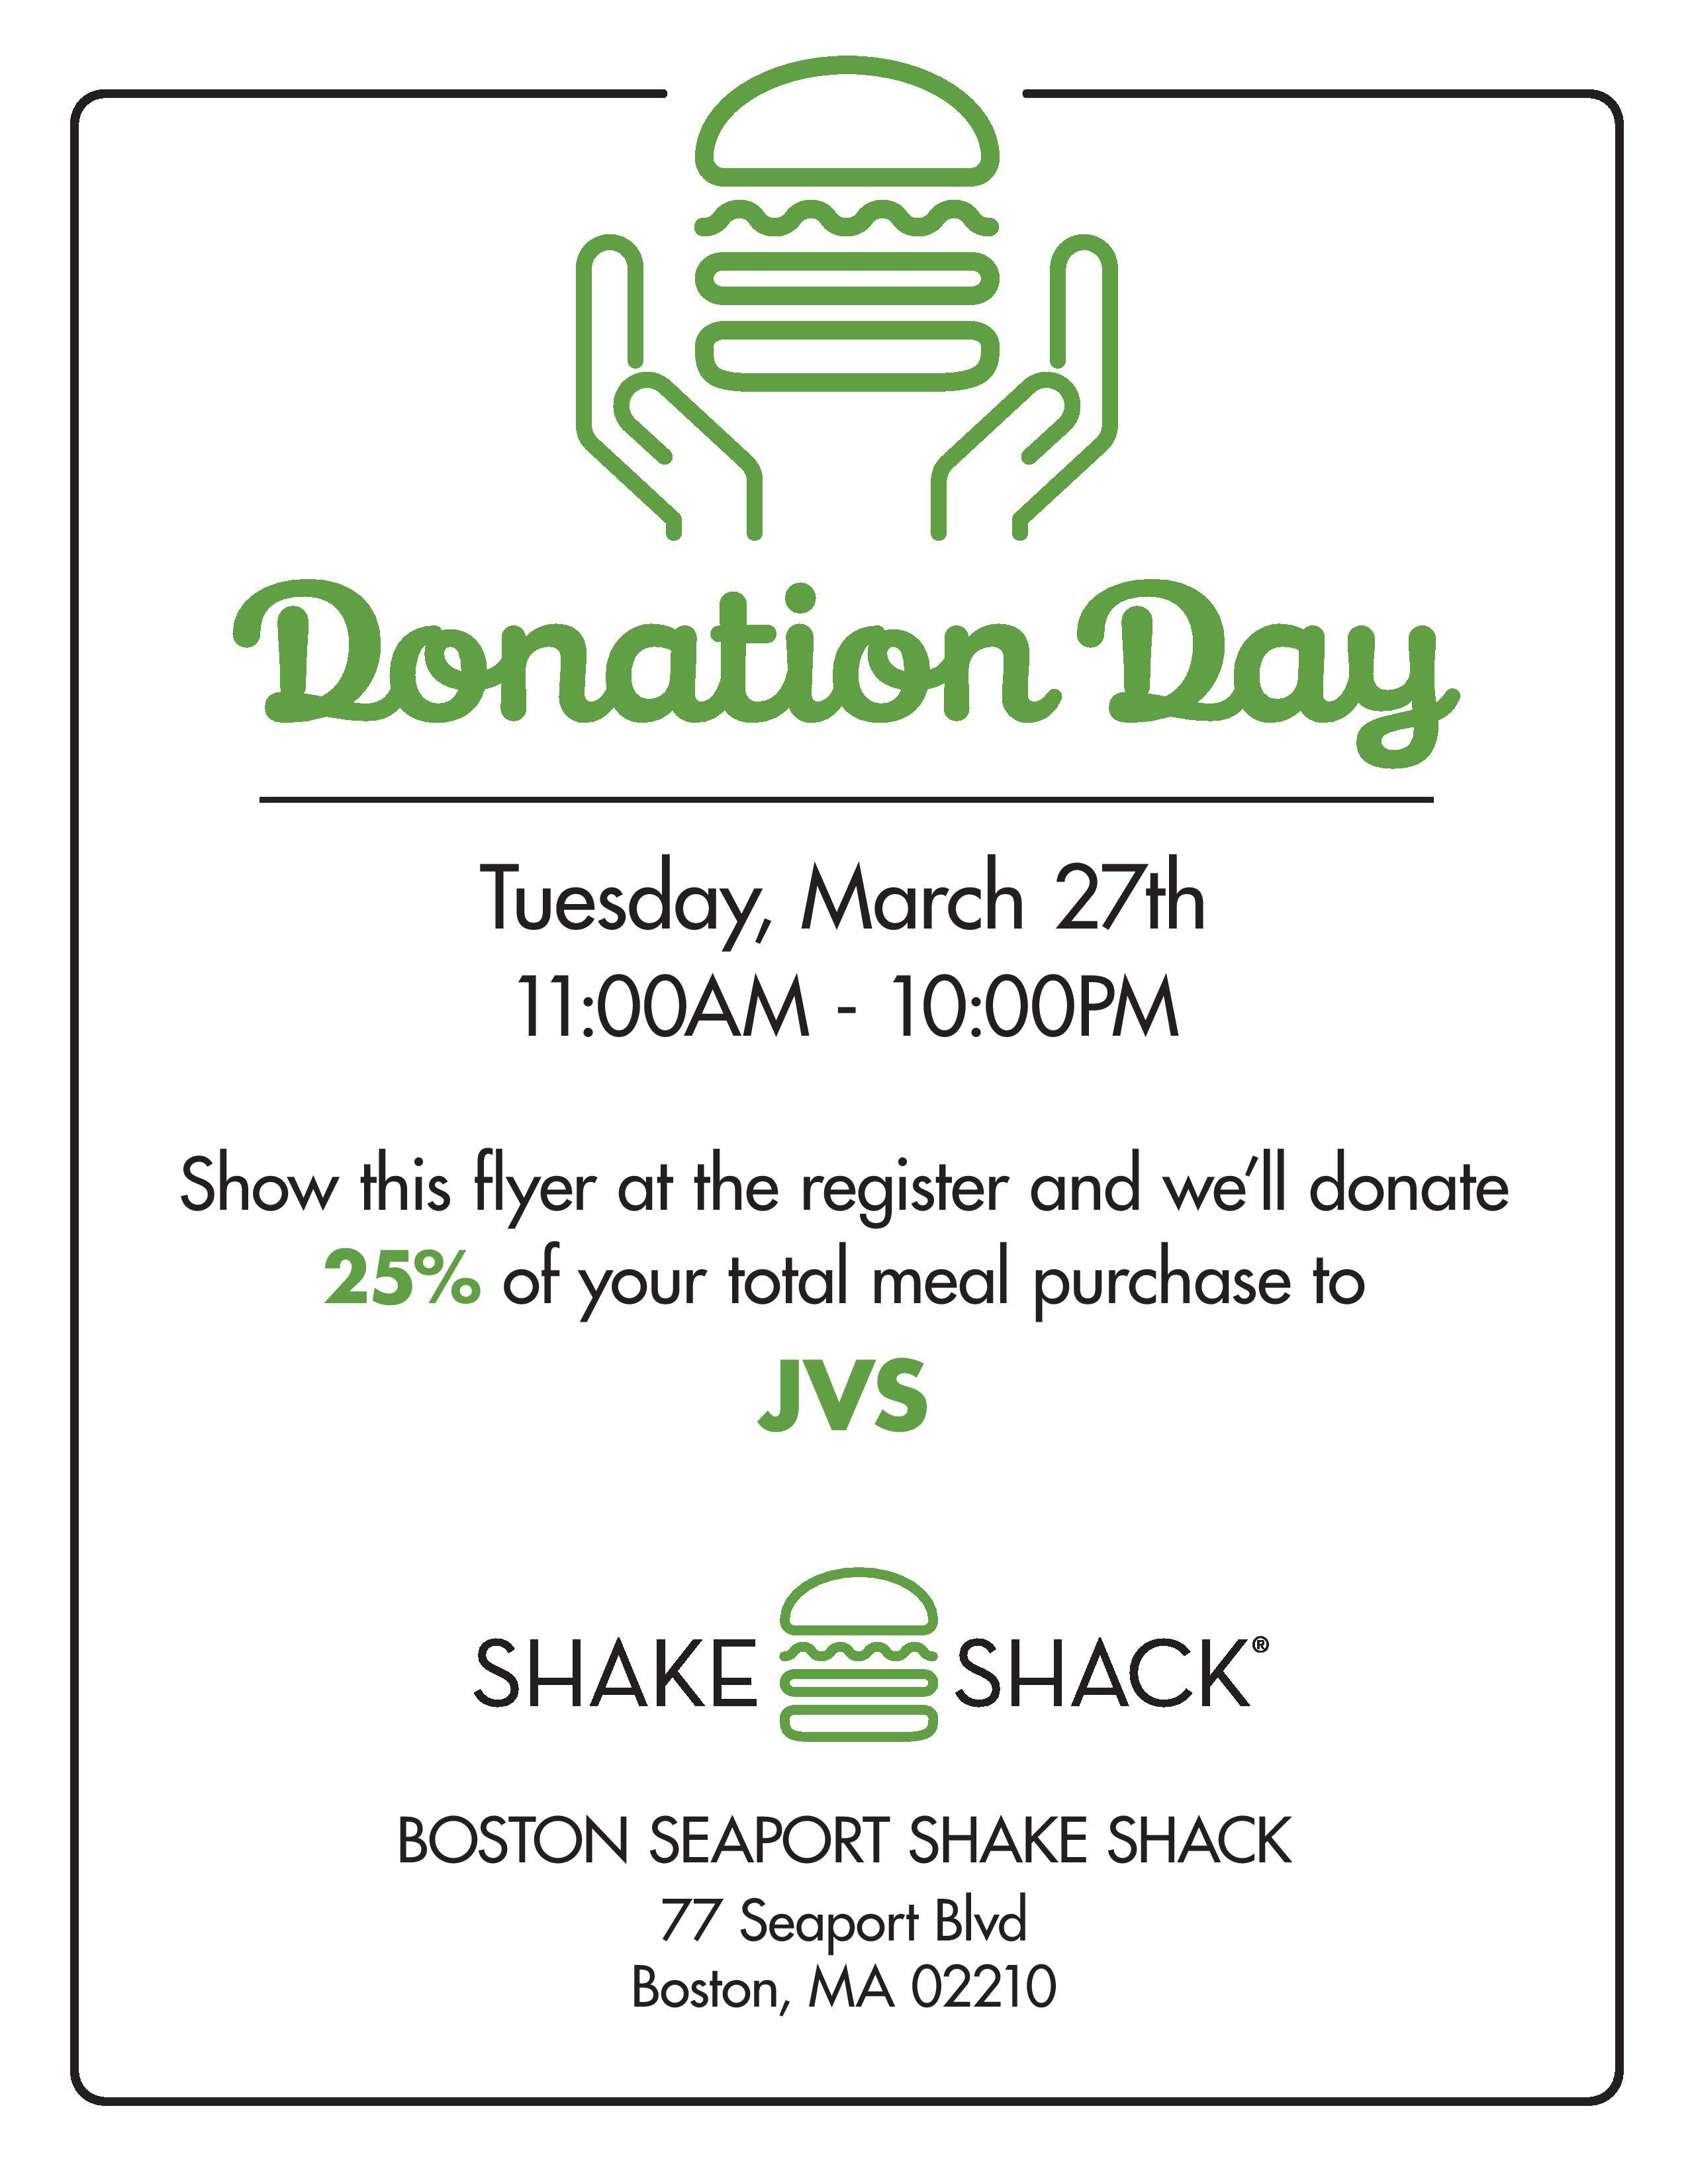 JVS Donation Day at Shake Shack - JVS